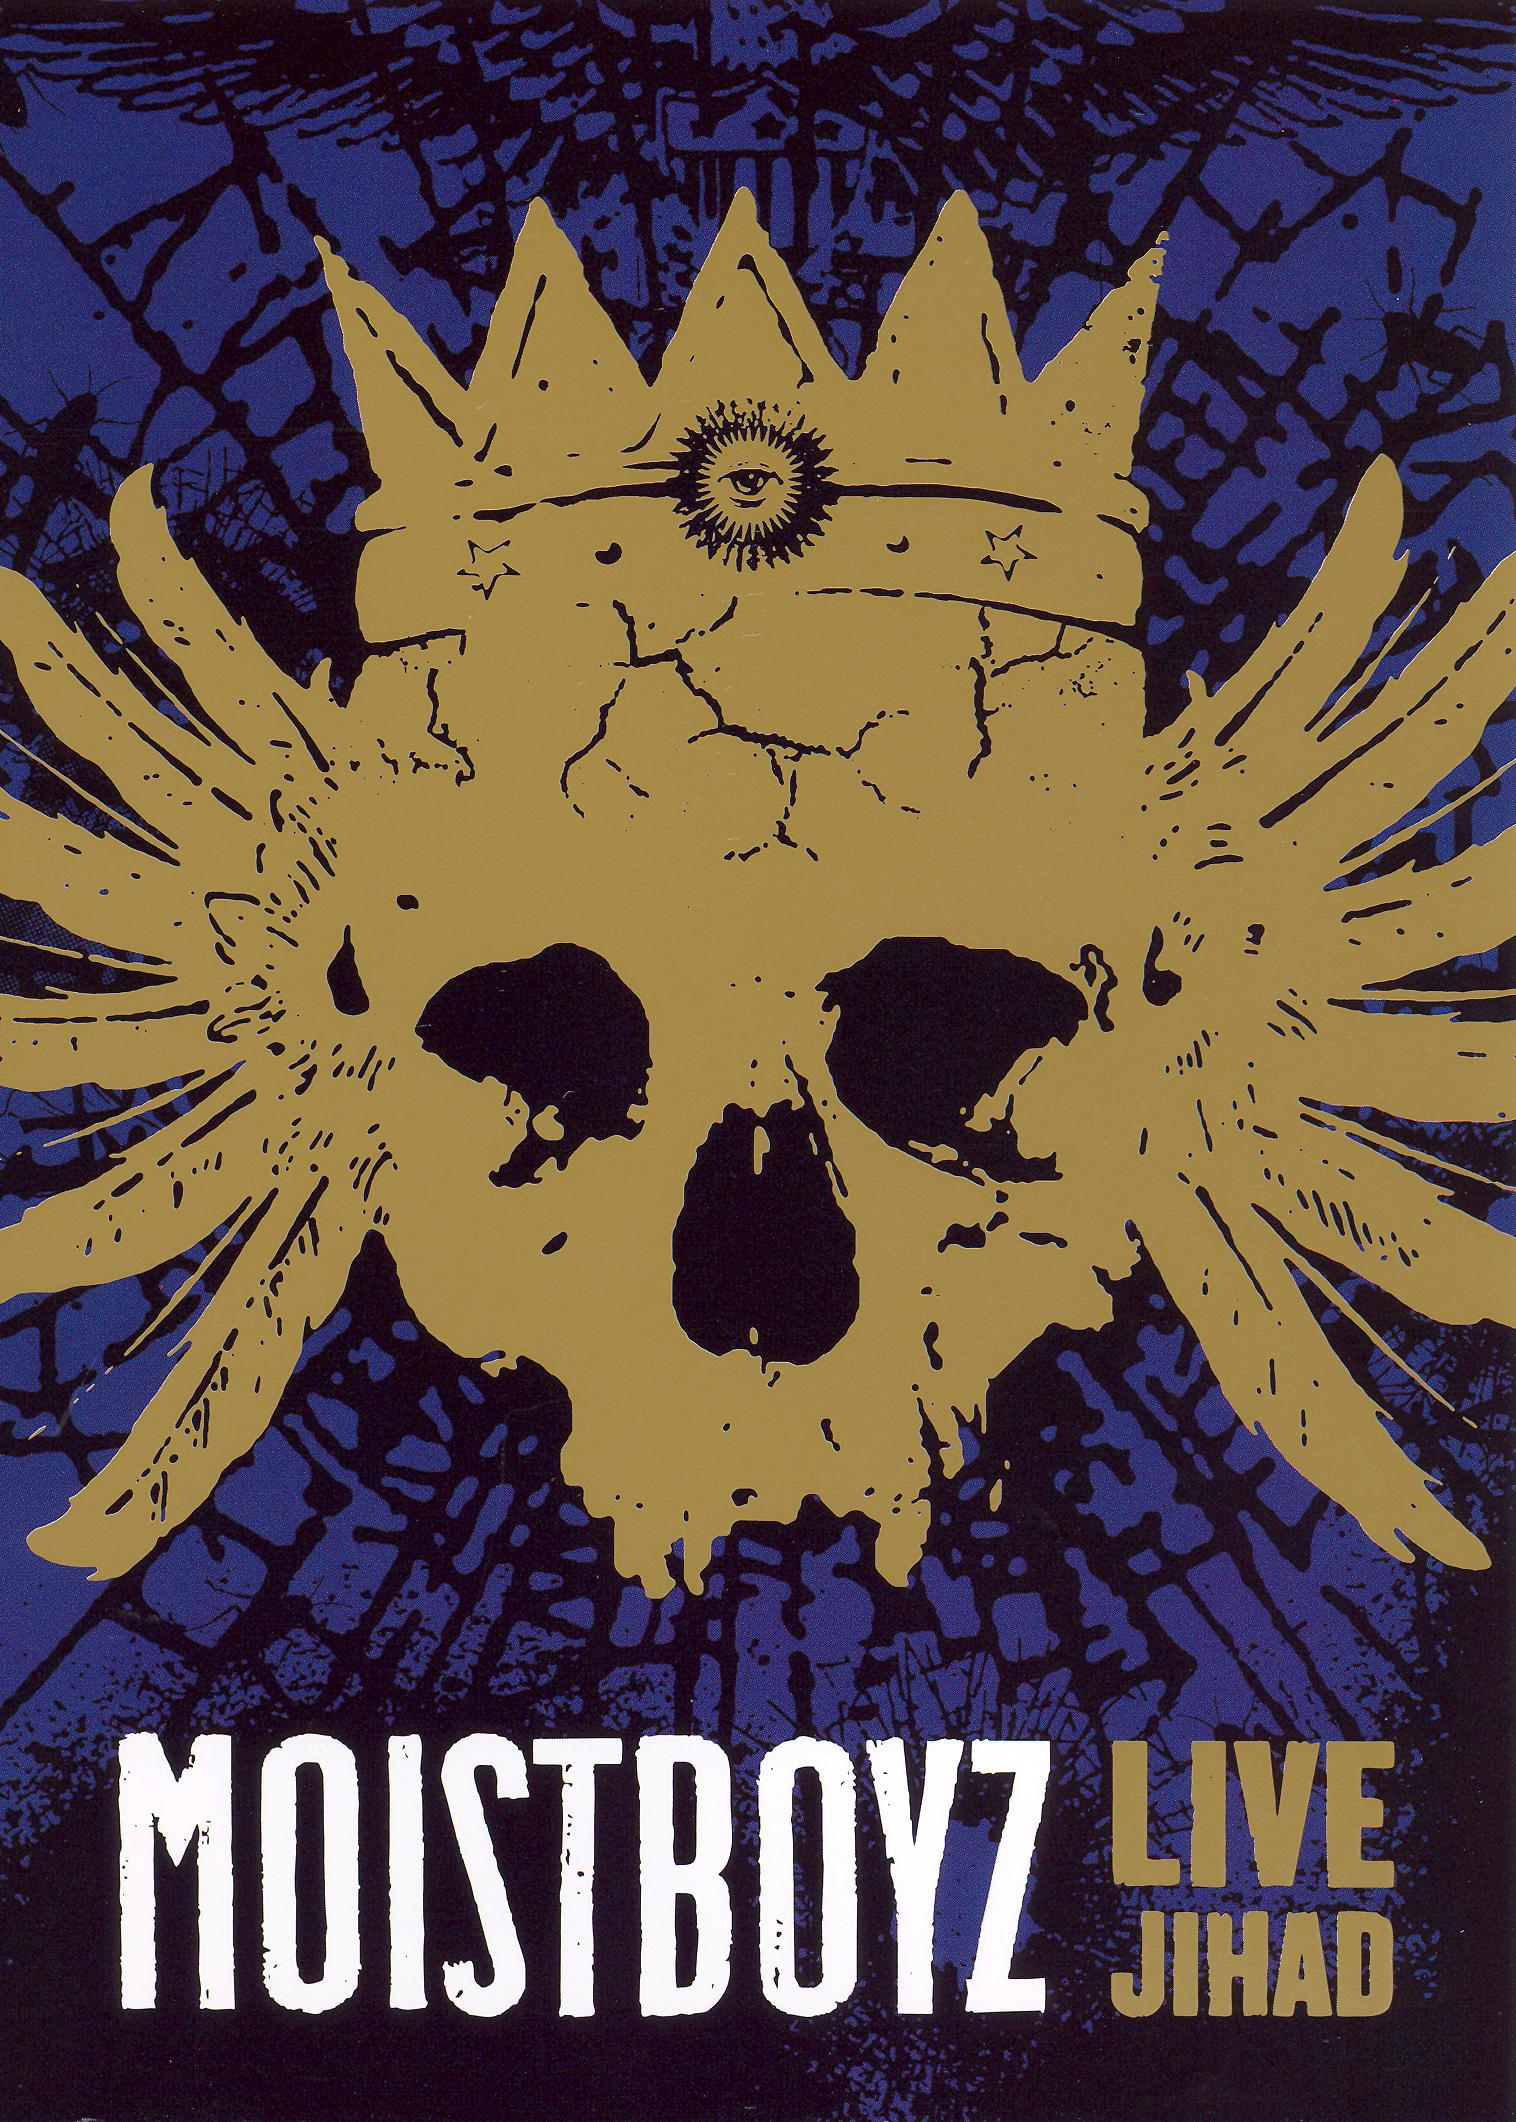 Moistboyz: Live Jihad